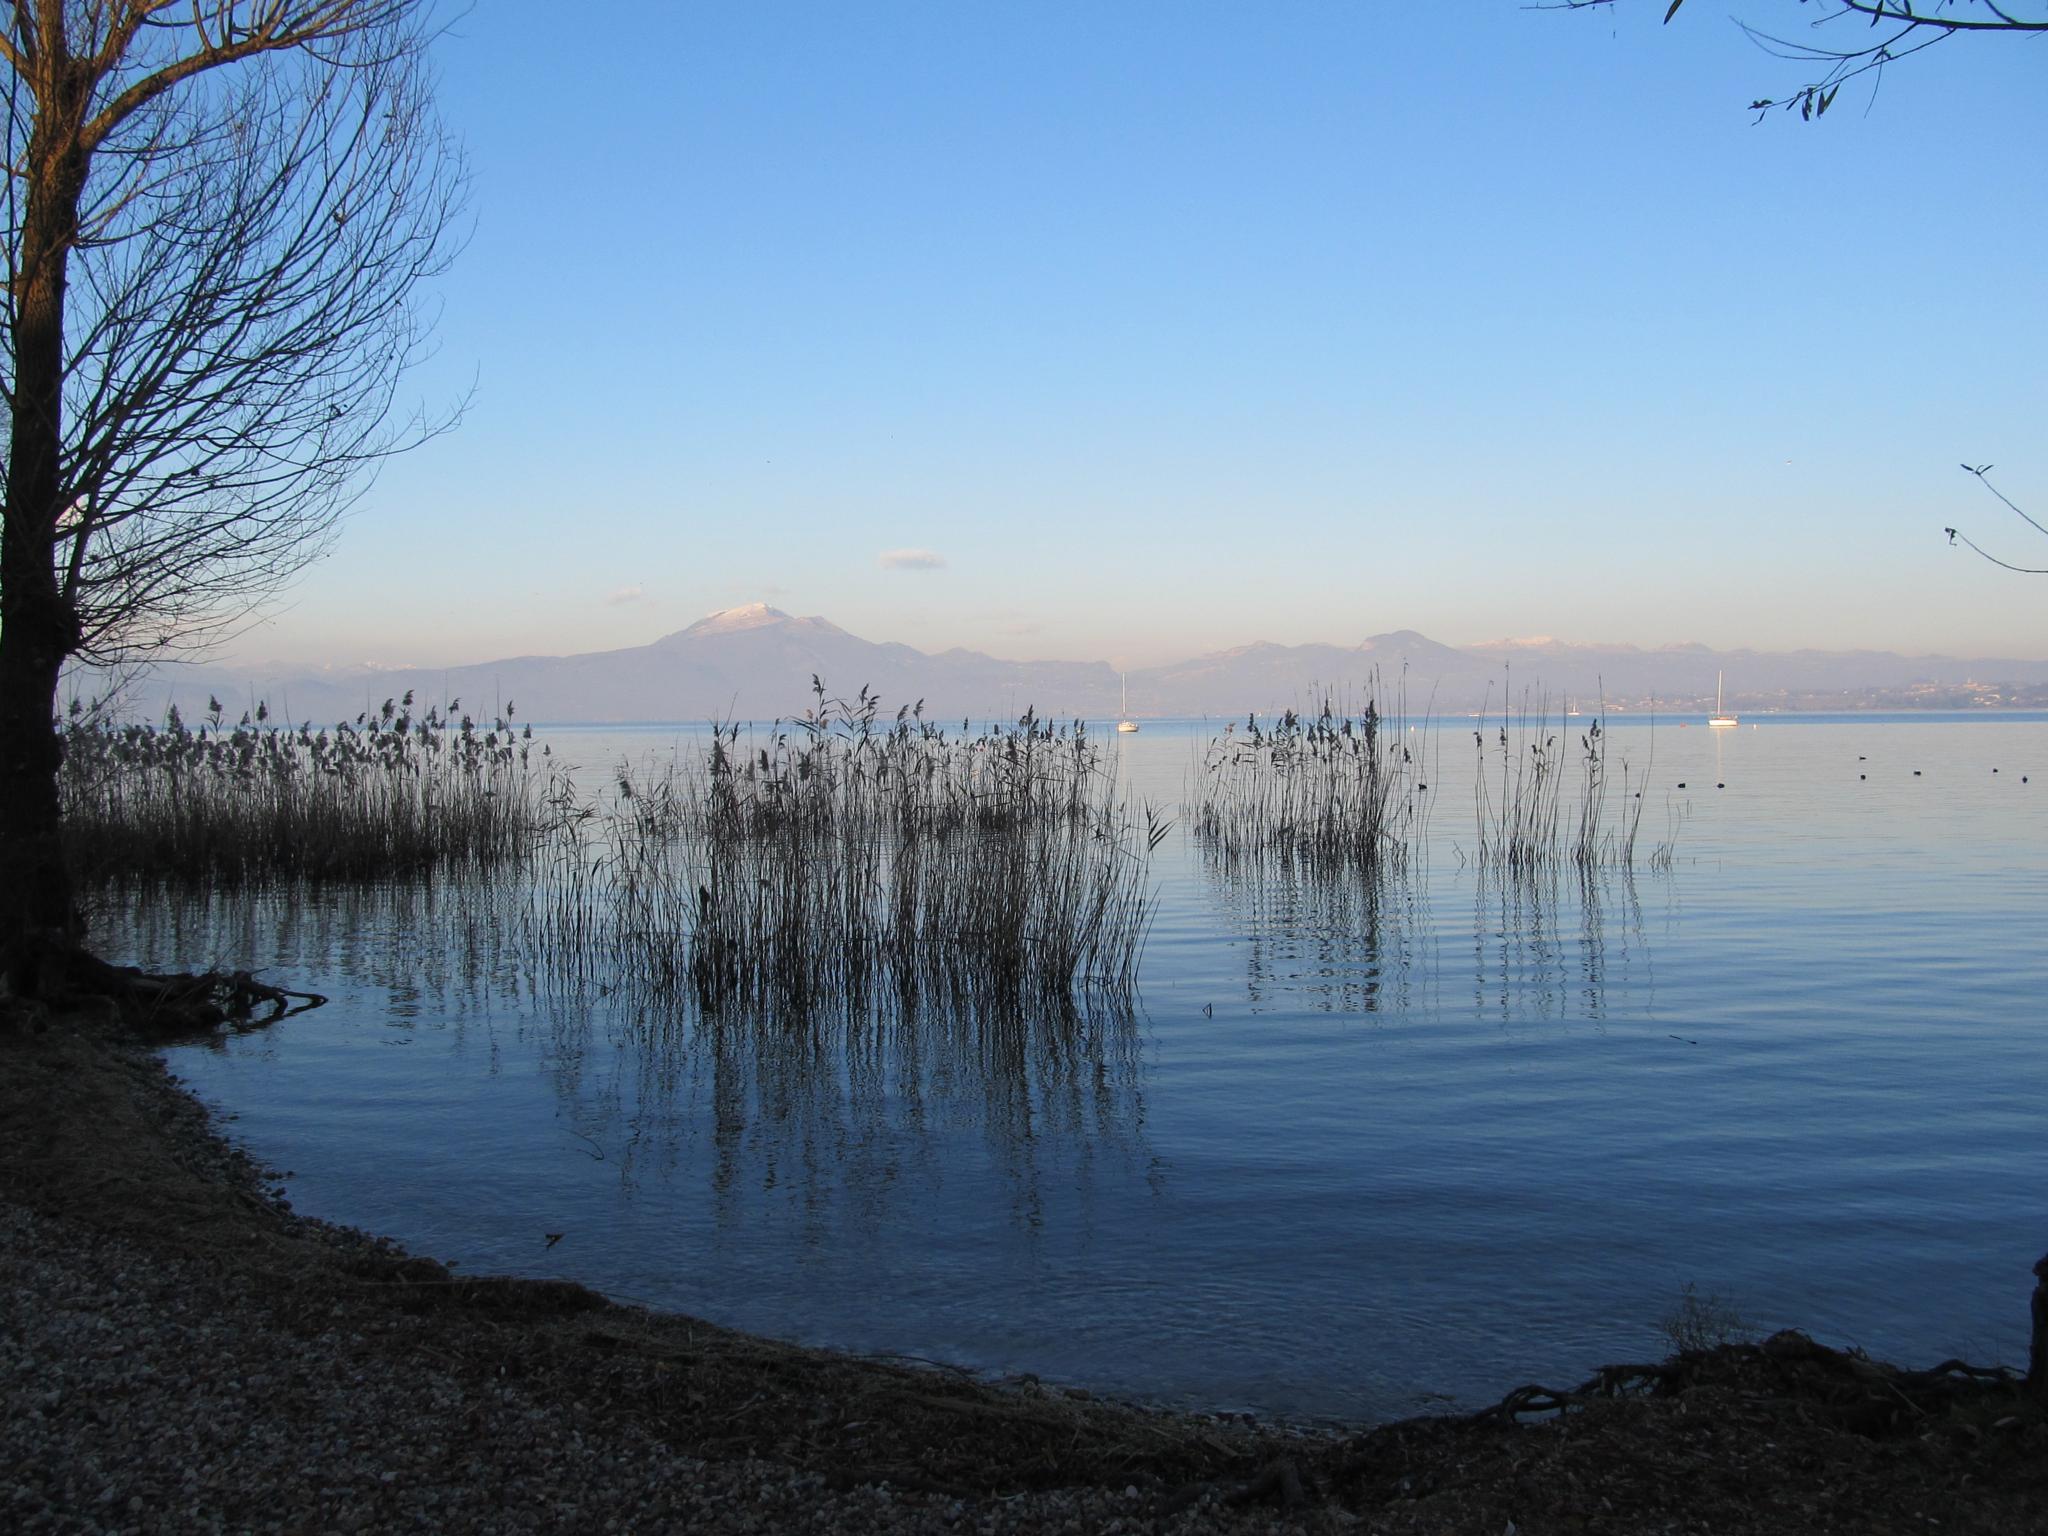 Lake Garda Italy by tracybertapelle